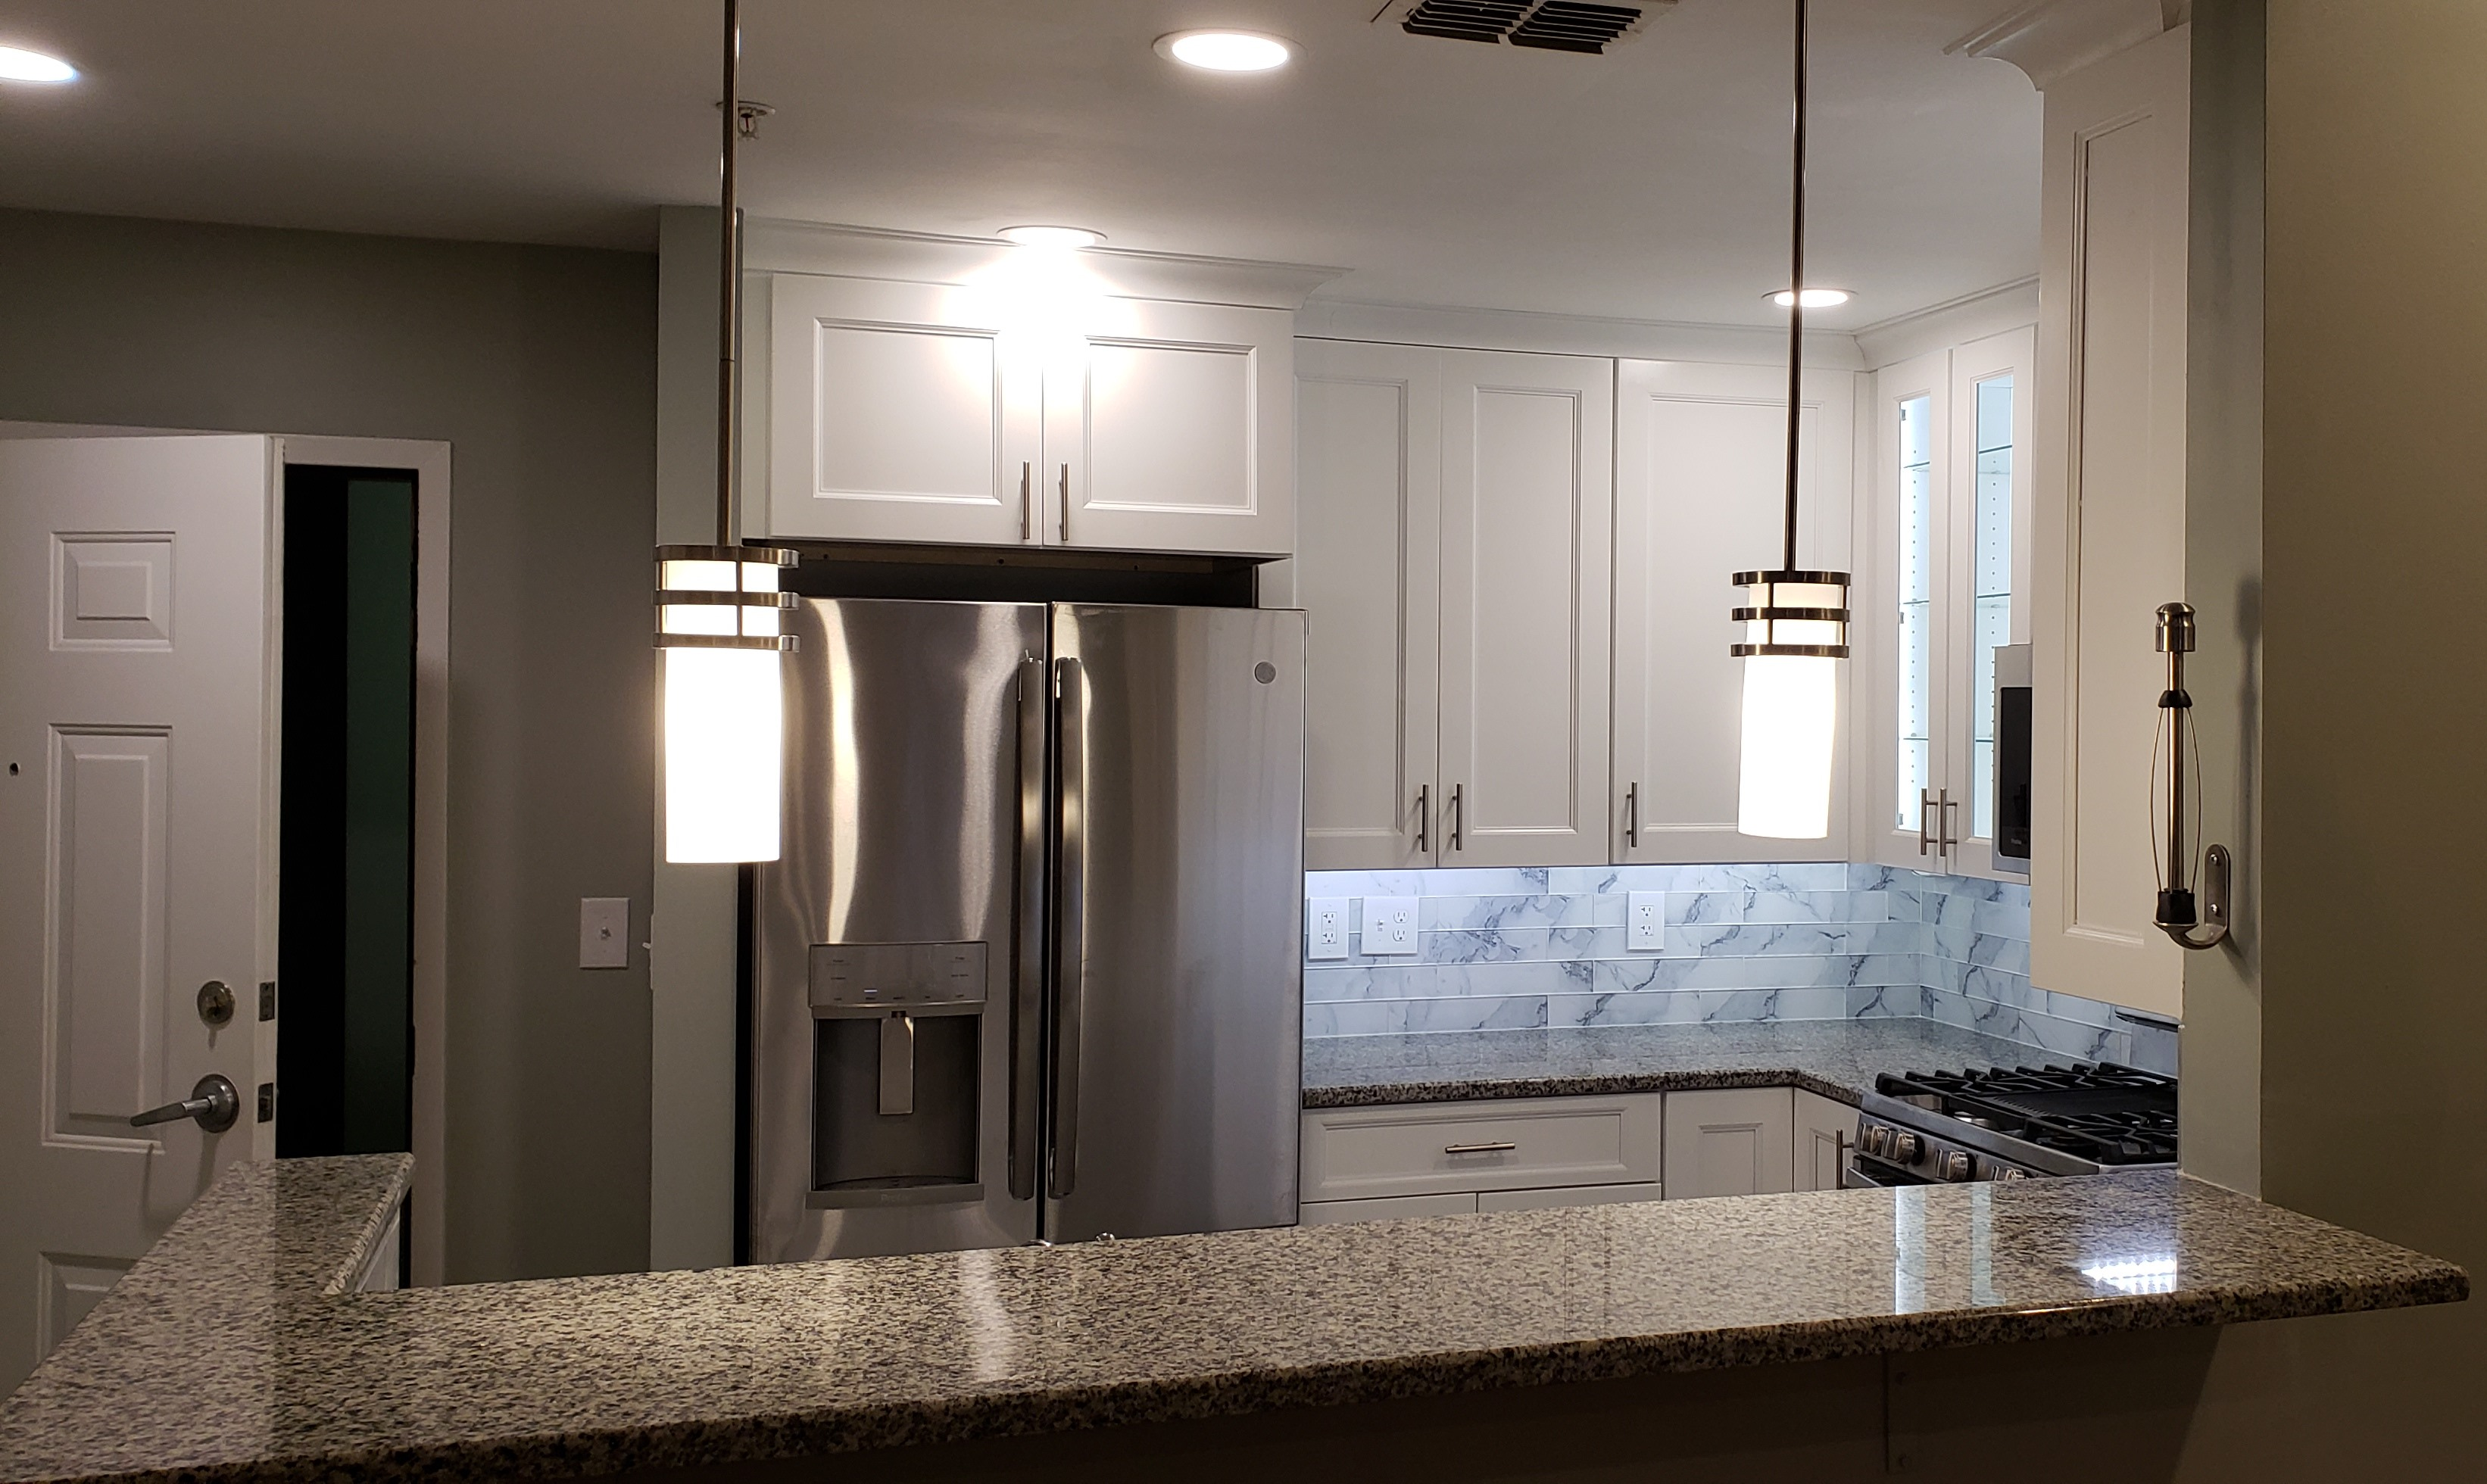 Kitchen renovation in Northern Virginia